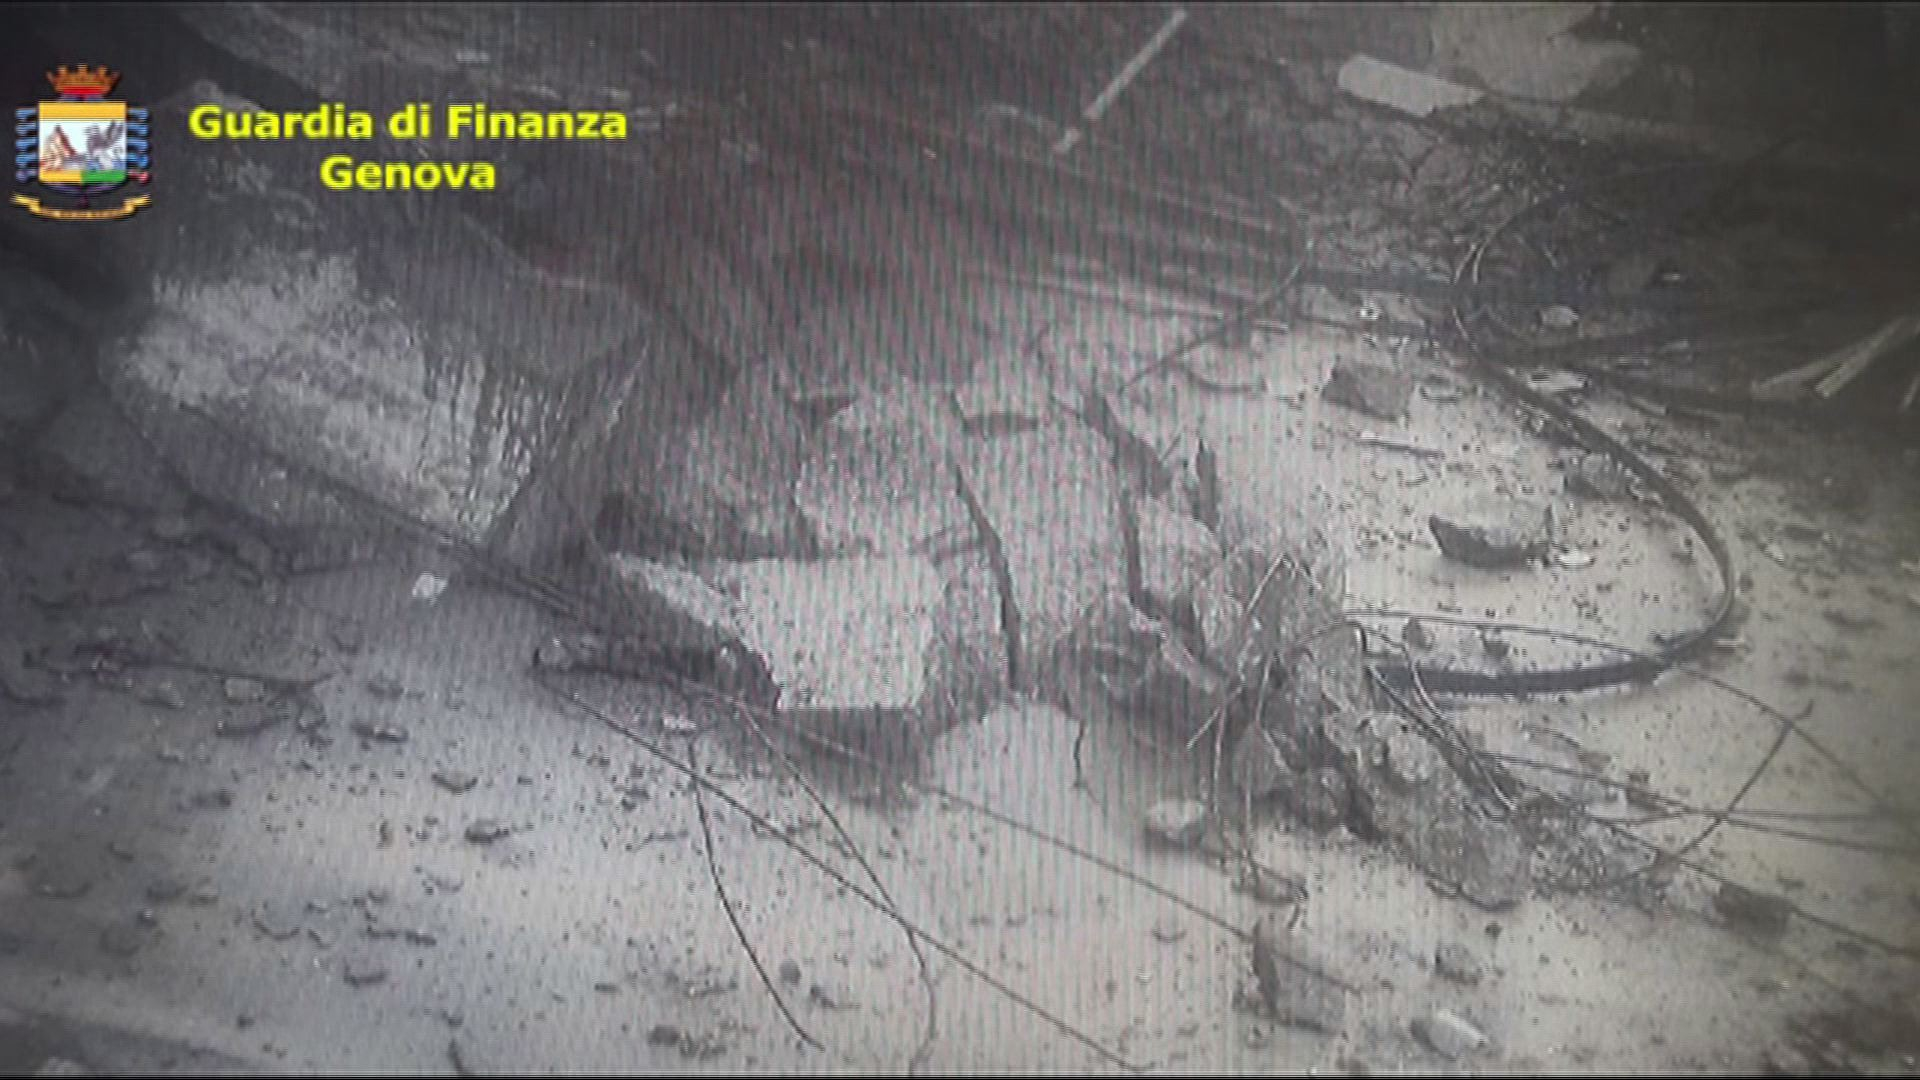 Cámaras de la Guardia di Finanza de Génova captaron el momento en que se derrumbó el puente Morandi.